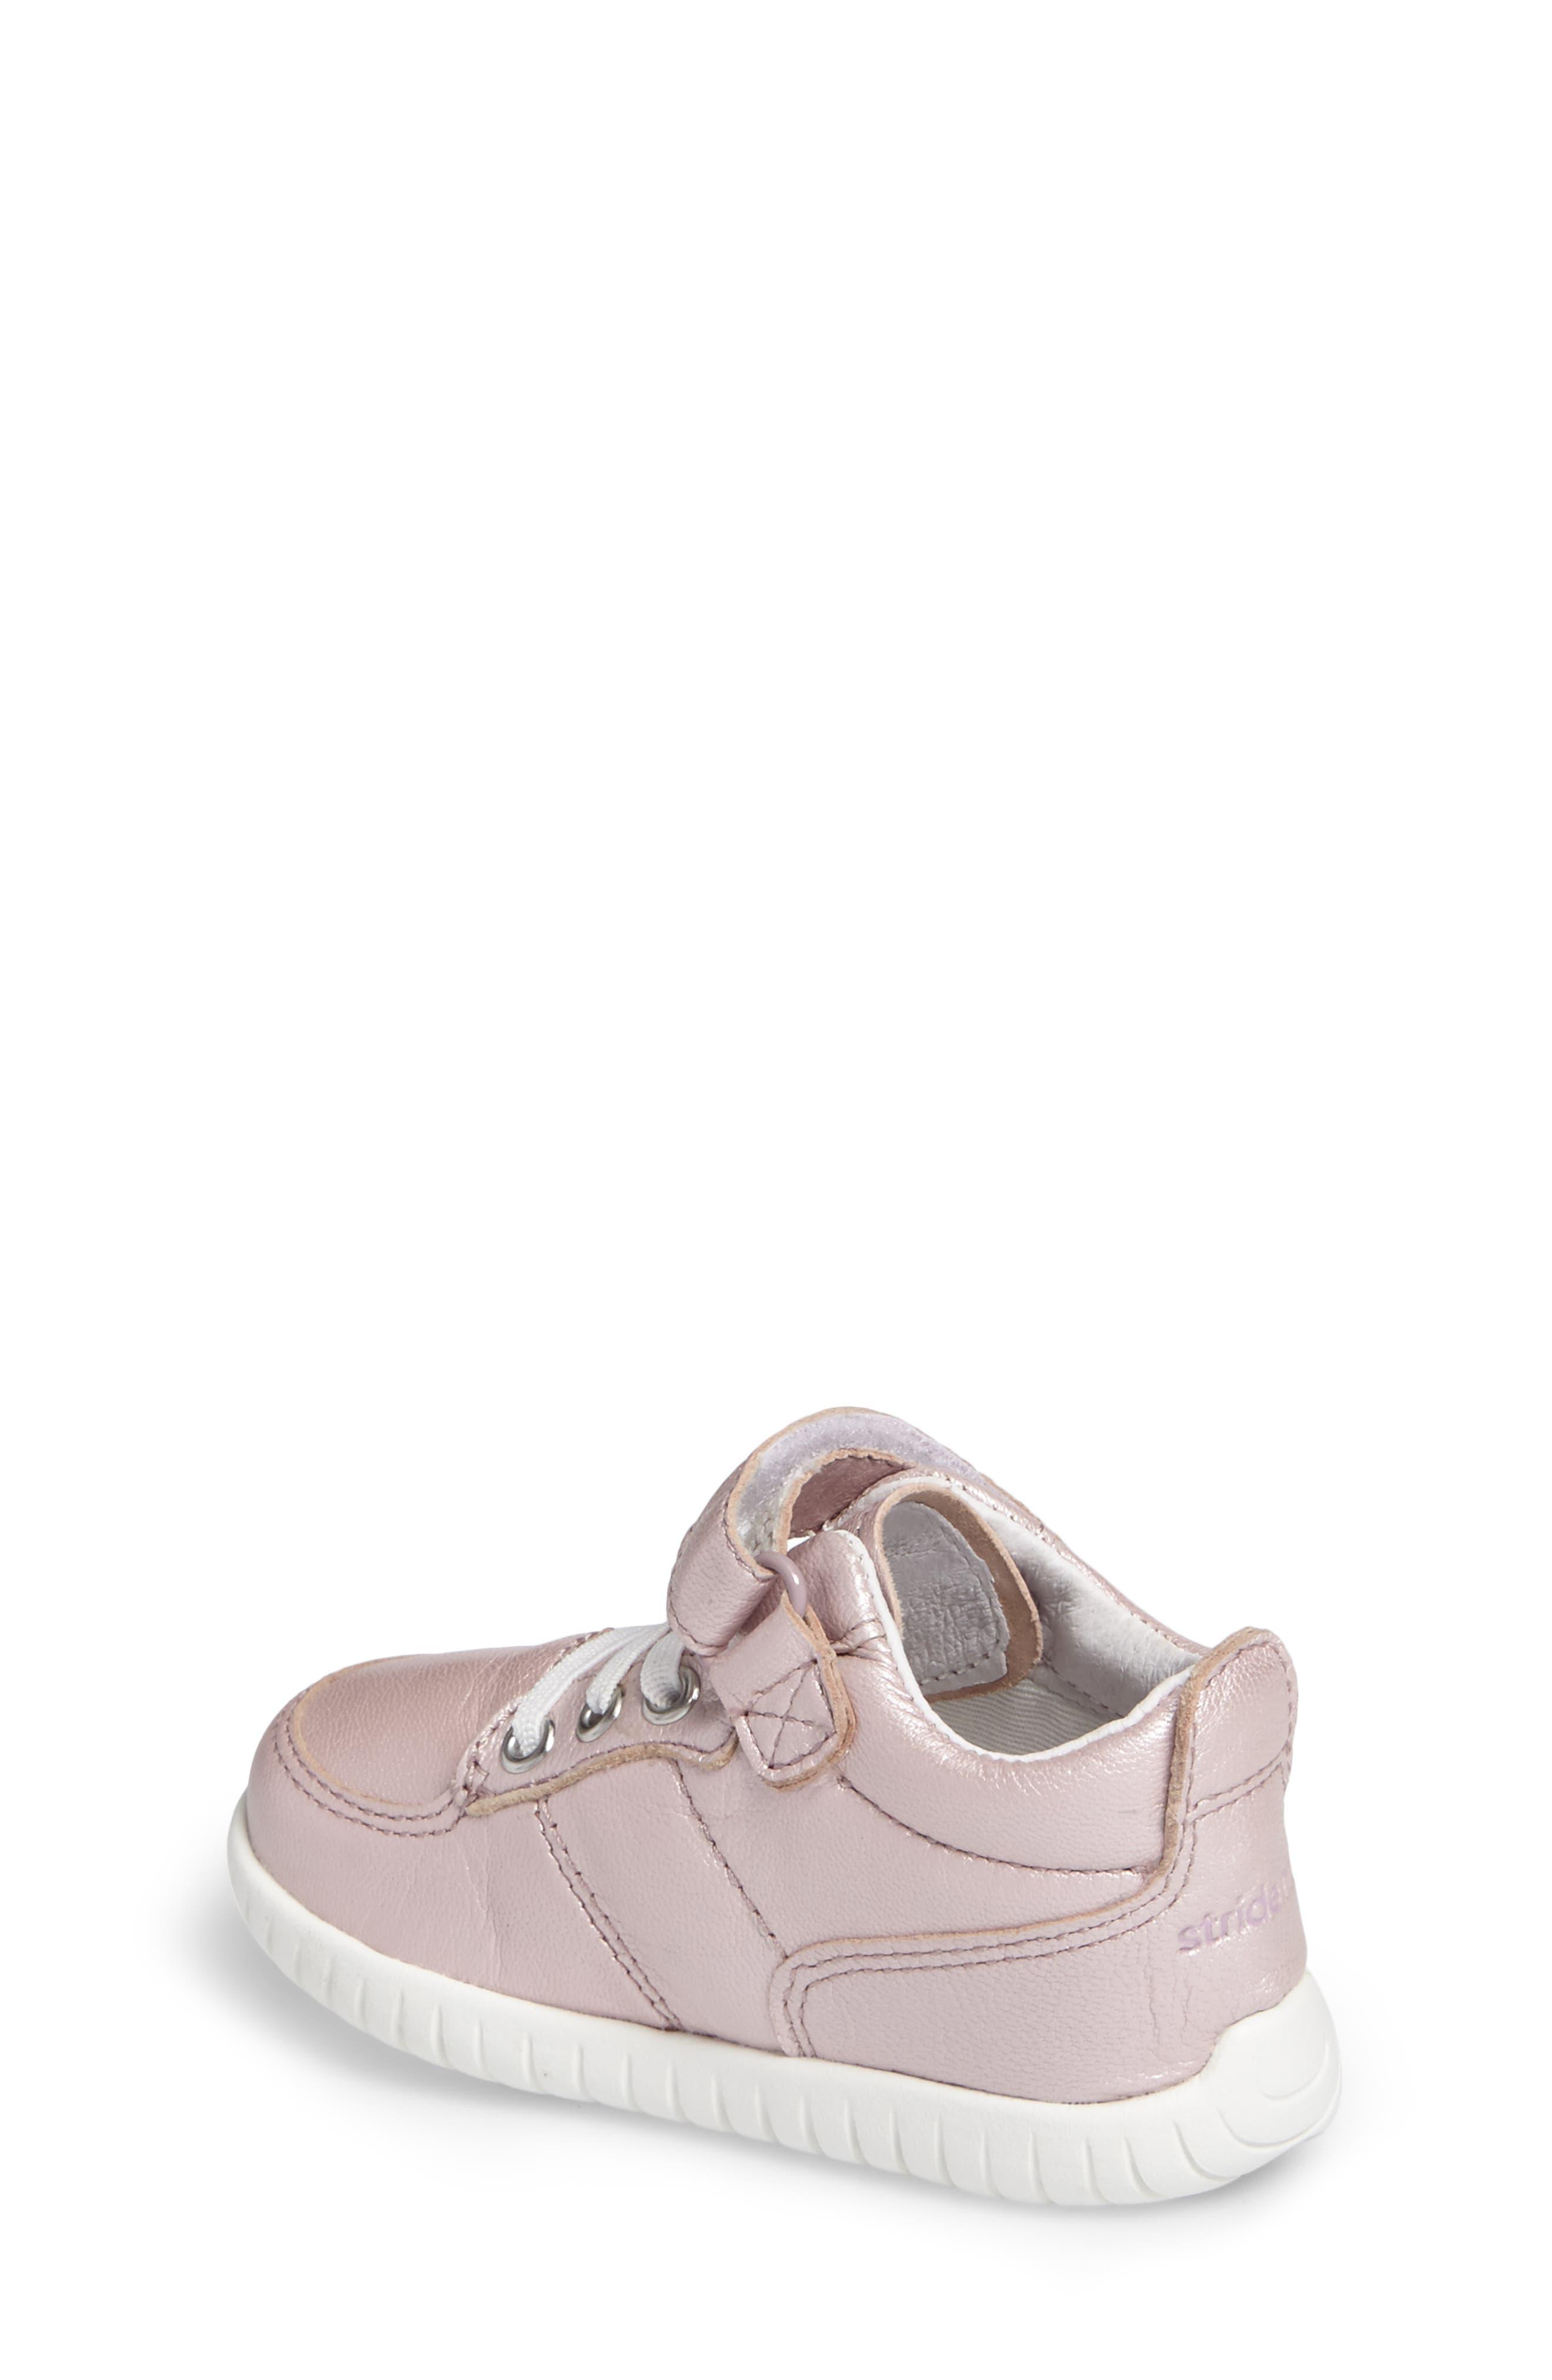 Bailey High Top Sneaker,                             Alternate thumbnail 2, color,                             PINK METALLIC